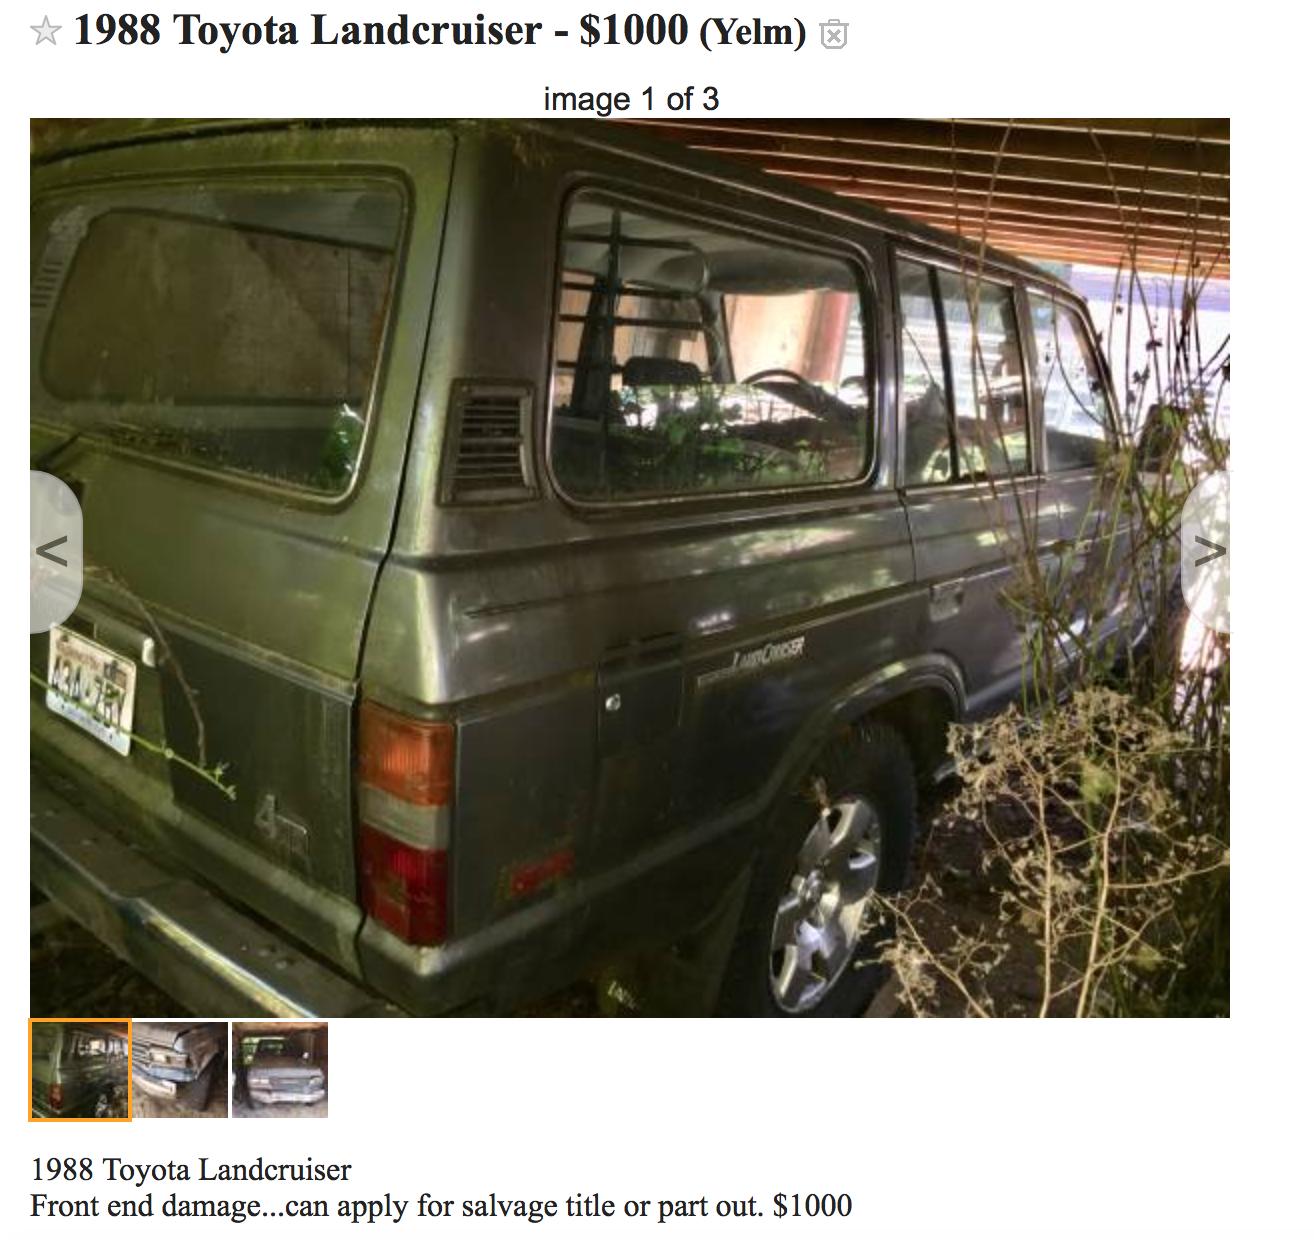 For Sale - craigslist, Olympia, WA, '88 FJ62, not mine ...